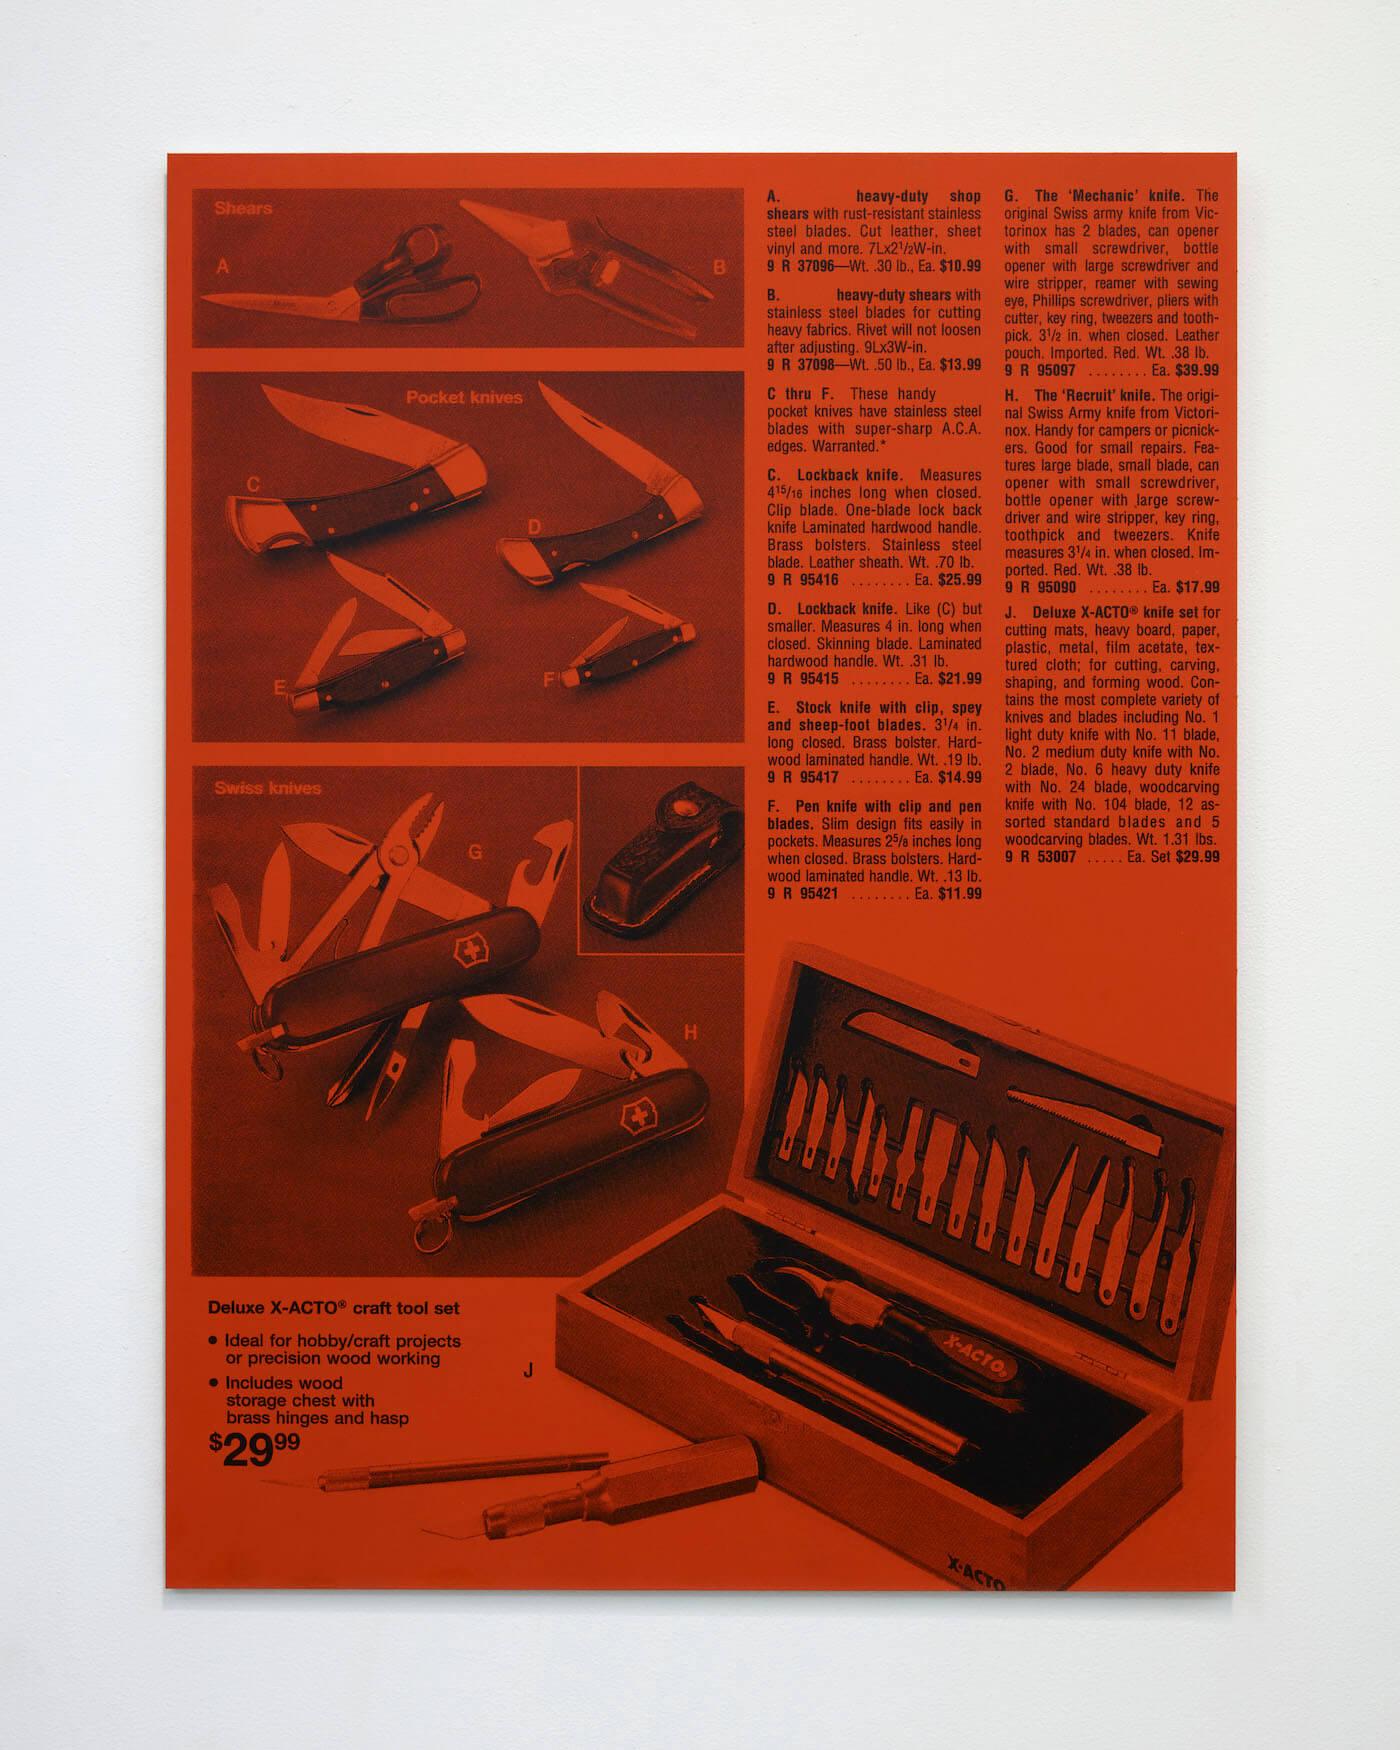 Jackson, Knives, 2020 (PJ 20.008) A